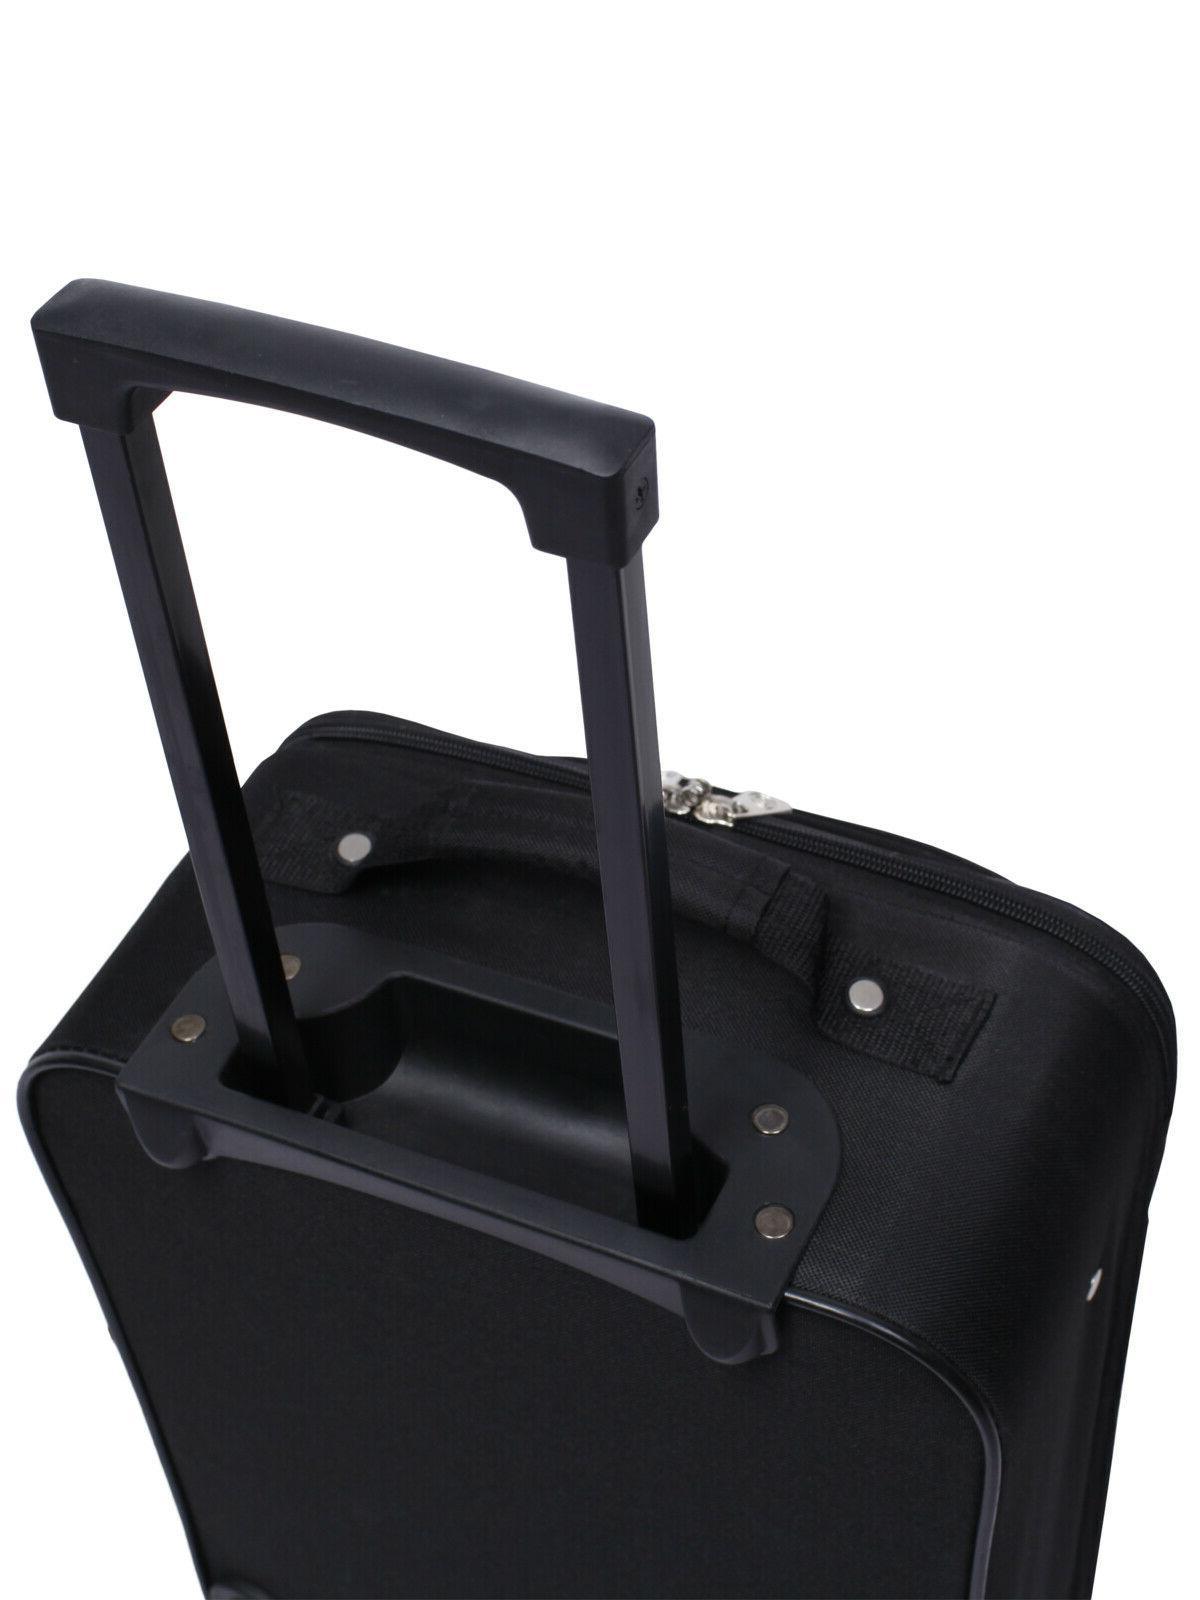 Pilot Case Carry-On Upright Handle Bag Black